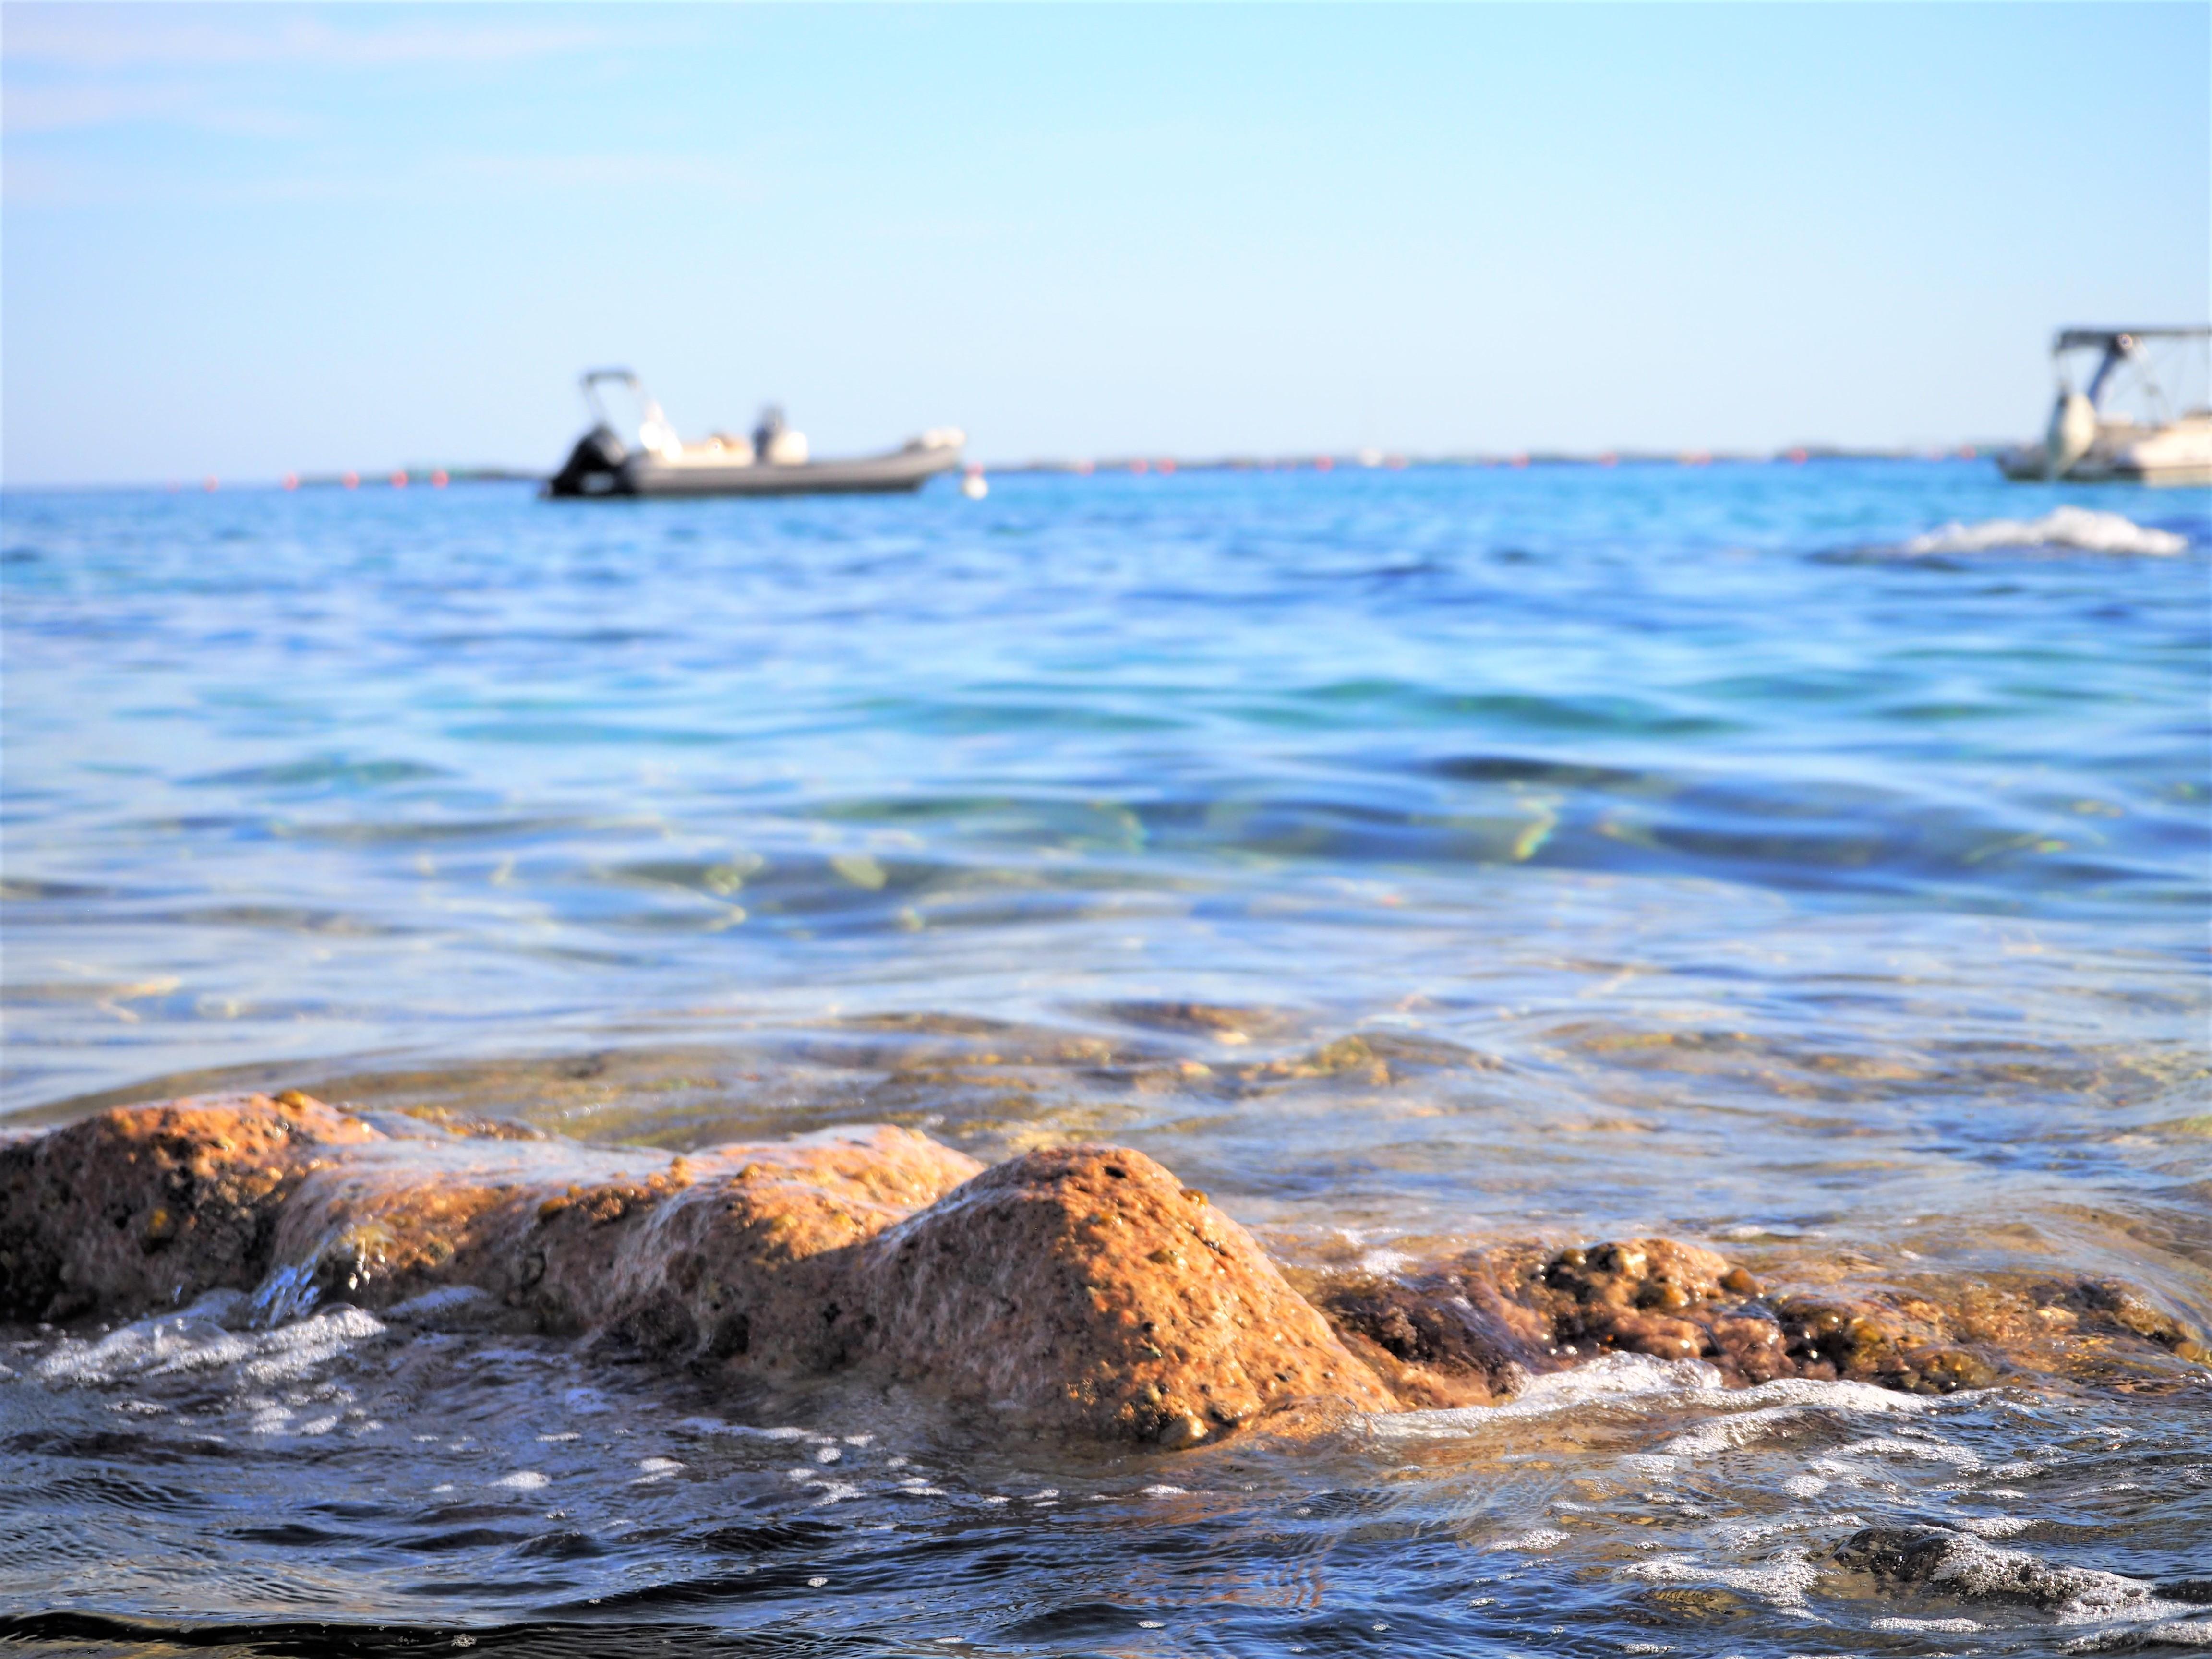 moorea plage ajaccio corse